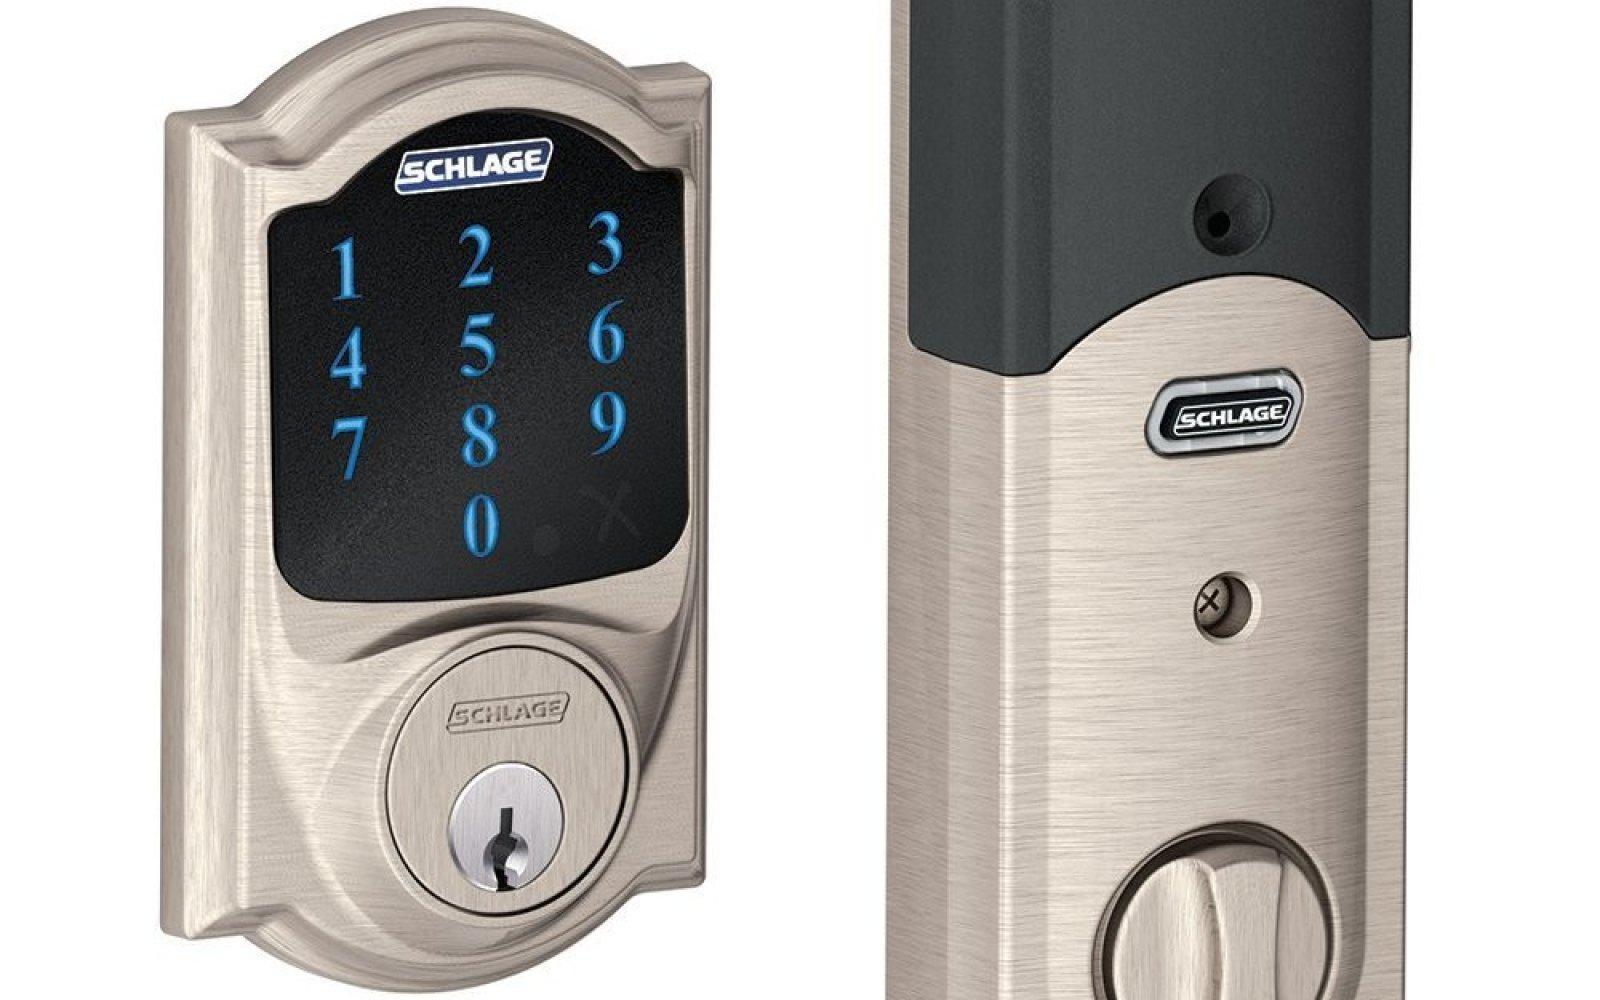 Home: Schlage Touchscreen Deadbolt $154 (orig. $431), Shark Ultralight upright vac $169 (orig. $200), kitchen items, more